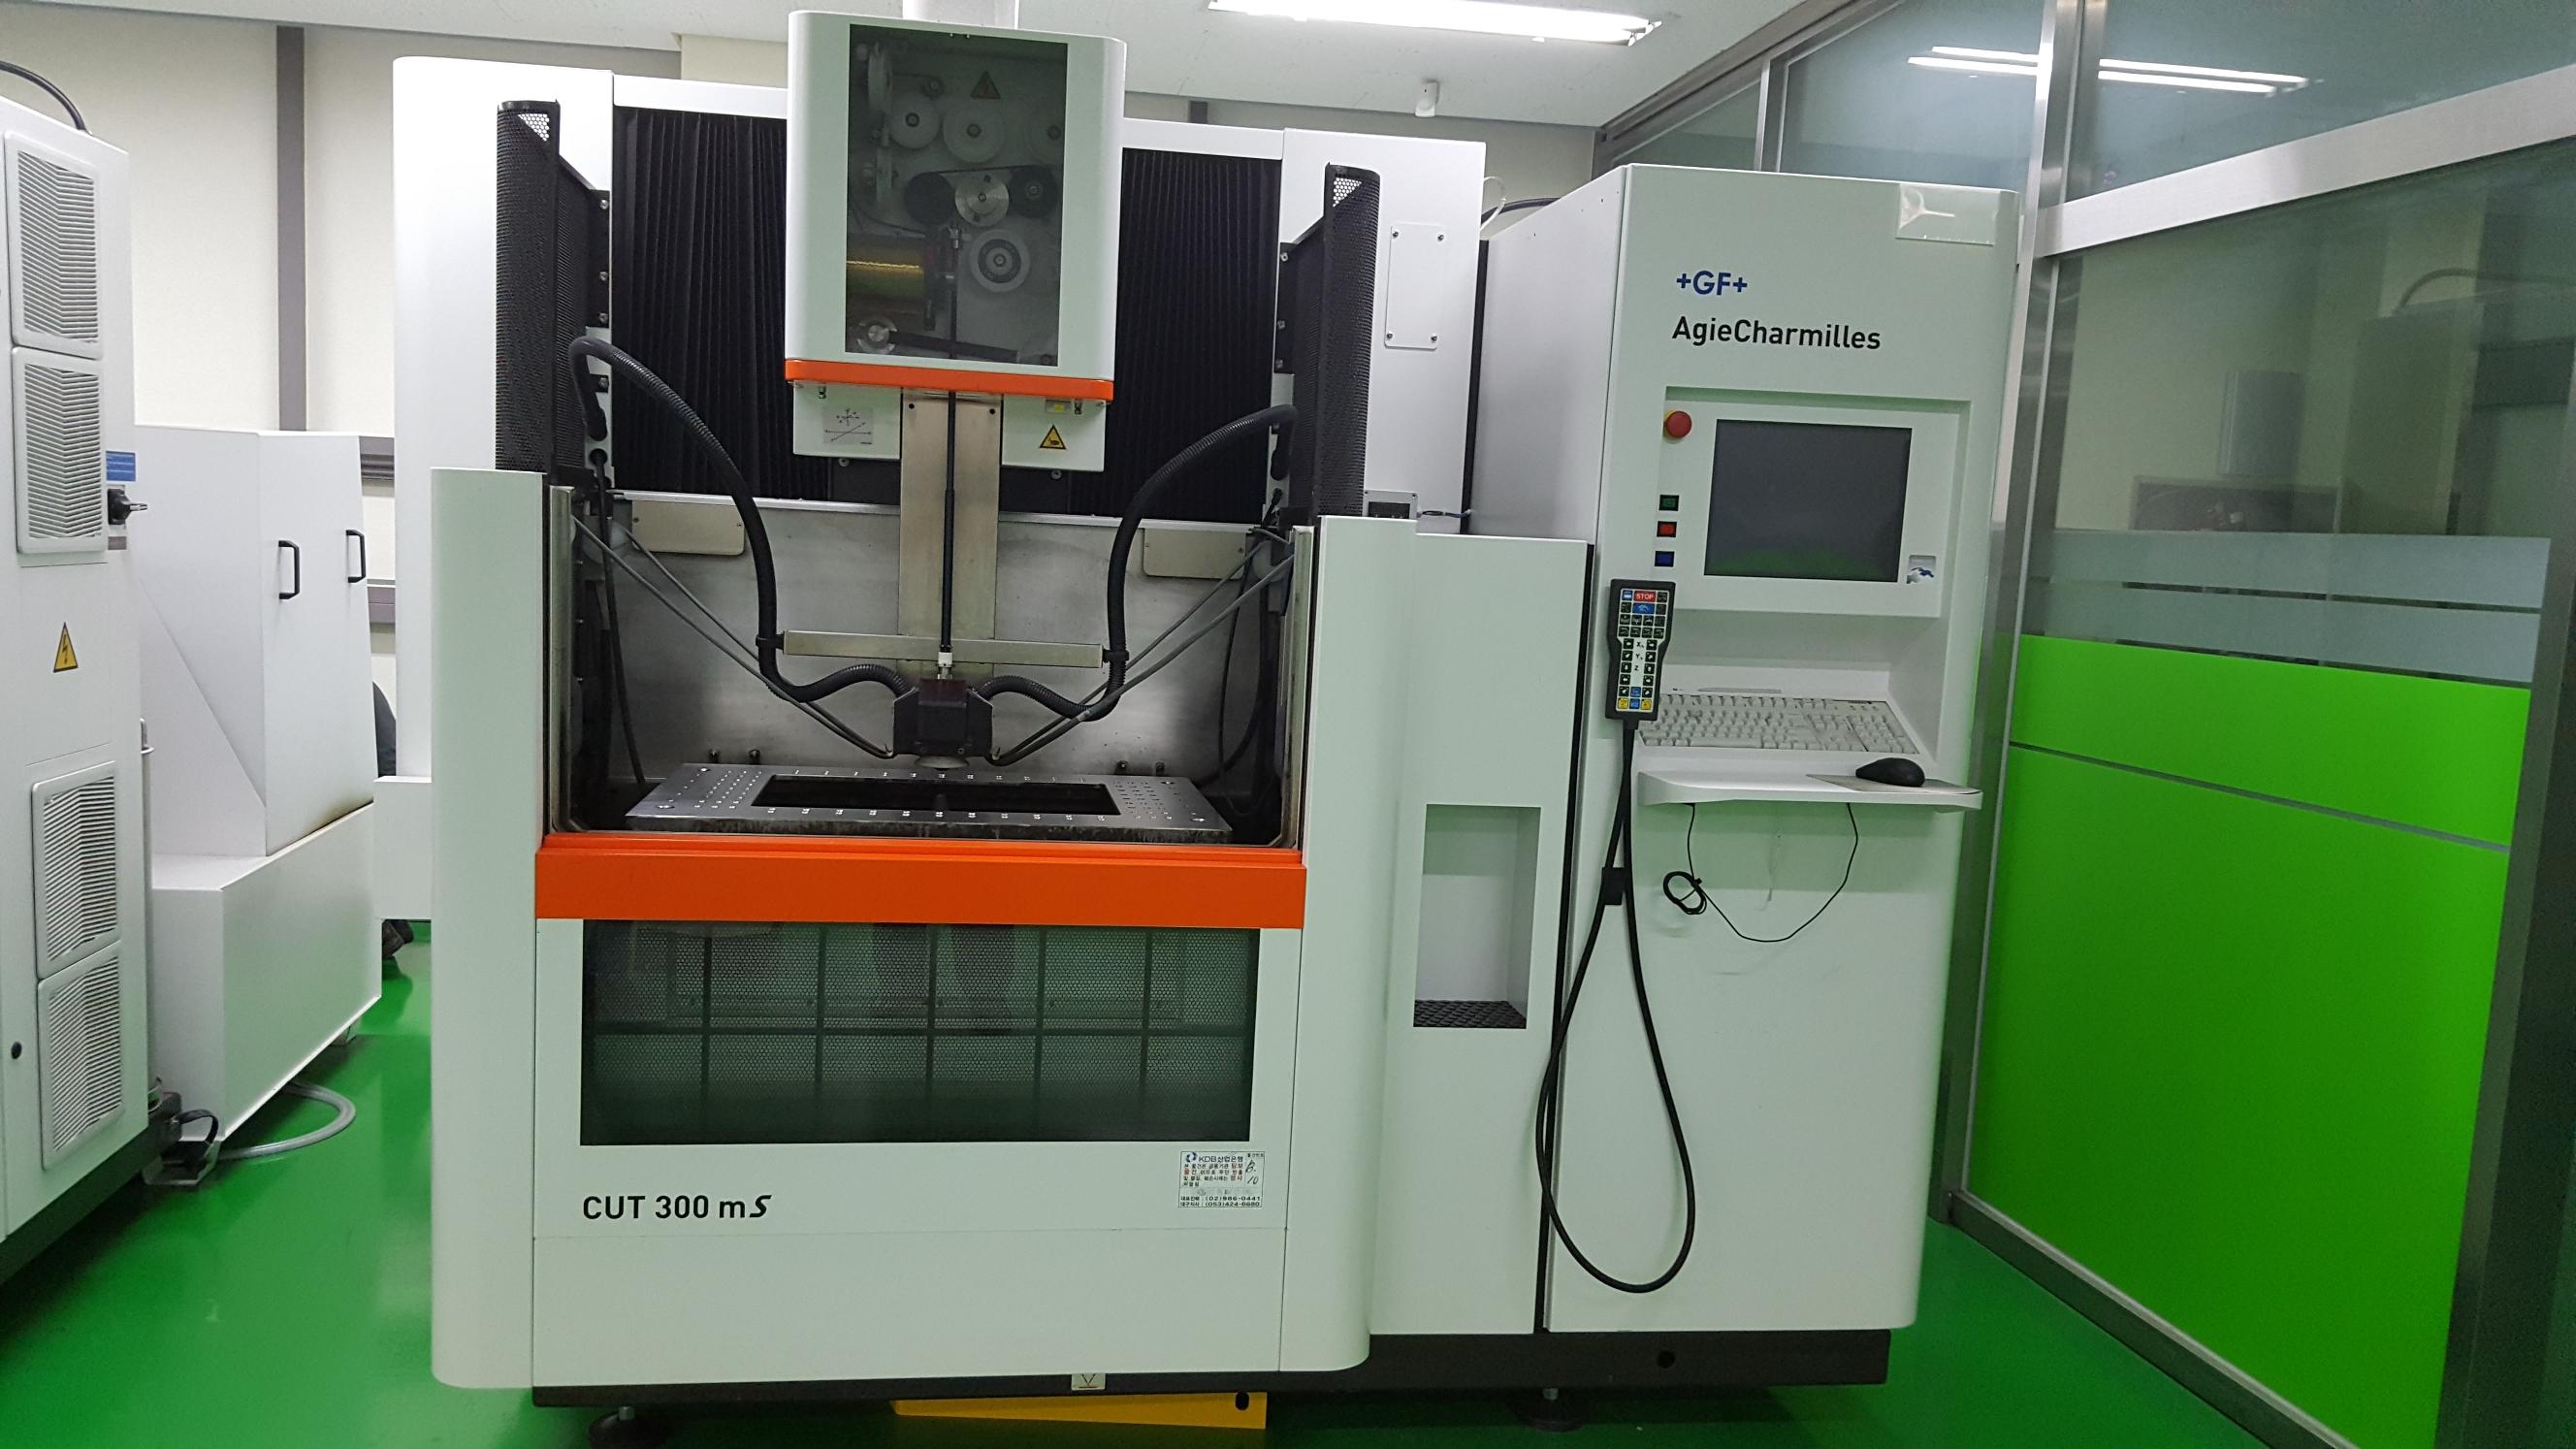 Agie Charmilles CUT 300mS Wire cutting edm machine - Exapro